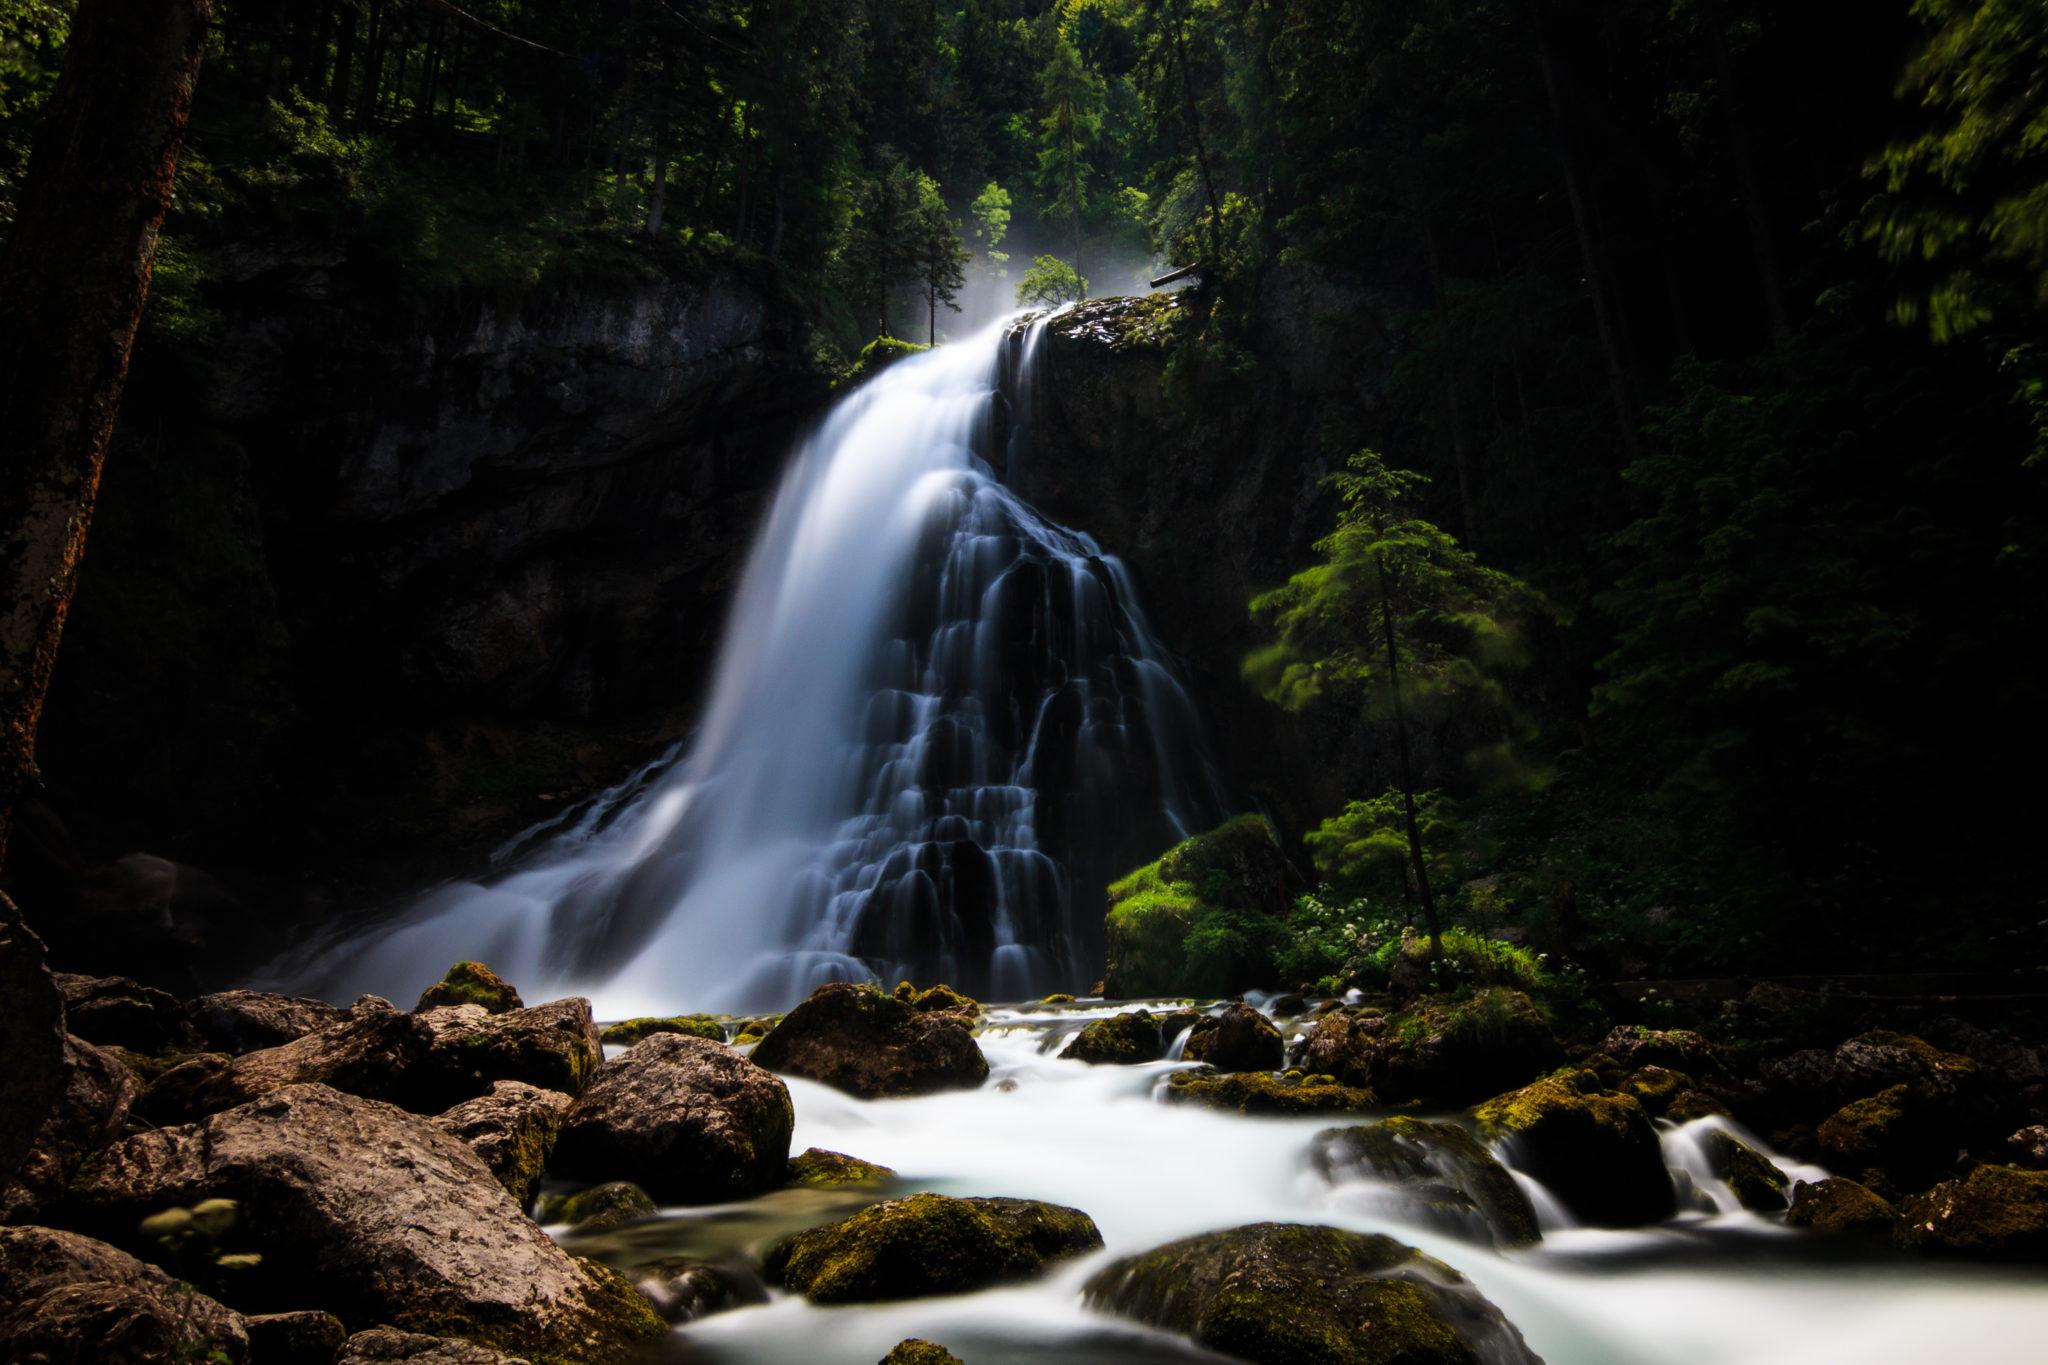 Gollinger Wasserfall I